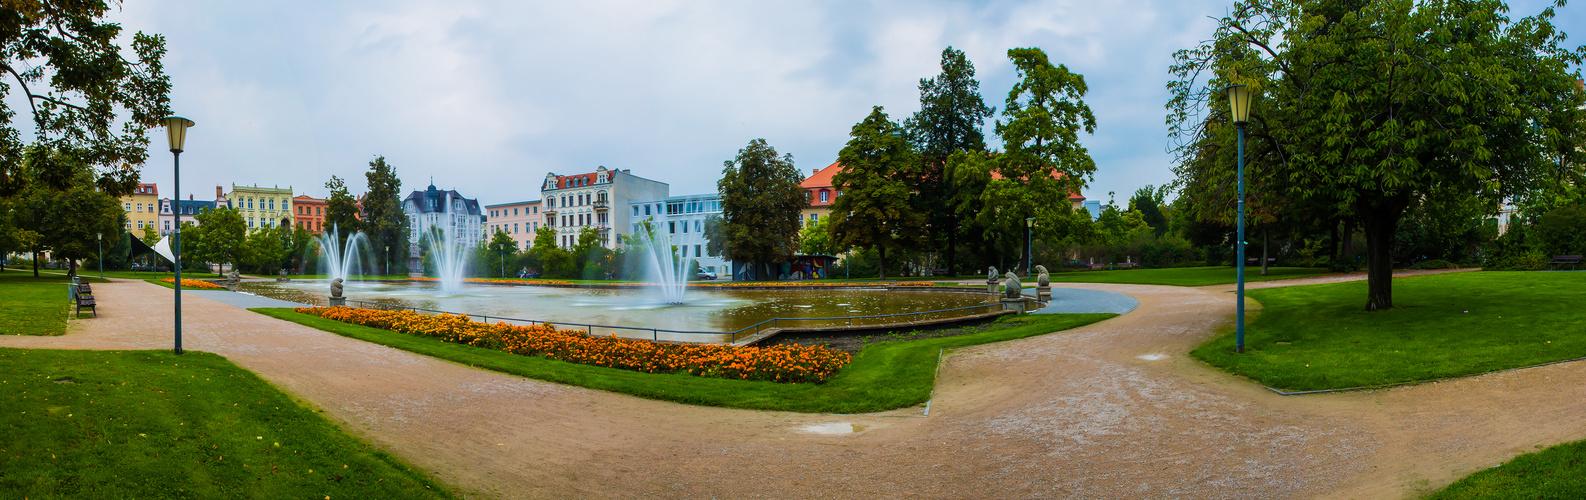 Schillerpark-Panorama